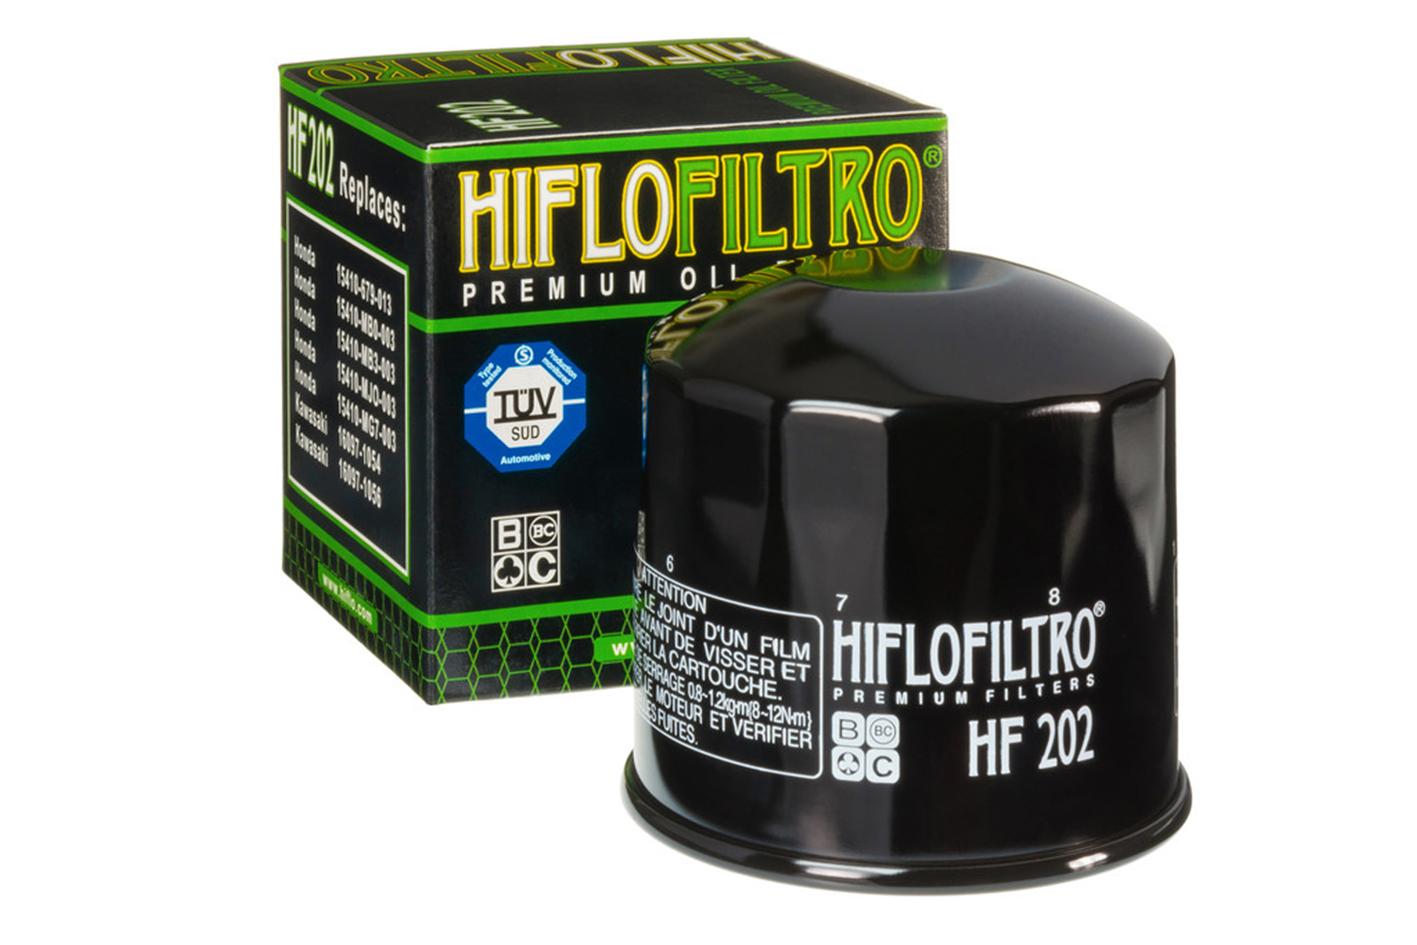 HIFLO HF202 Filtro Olio Moto Honda VF 750 Magna Kawasaki GPZ S 400 VN Vulcan - PZ